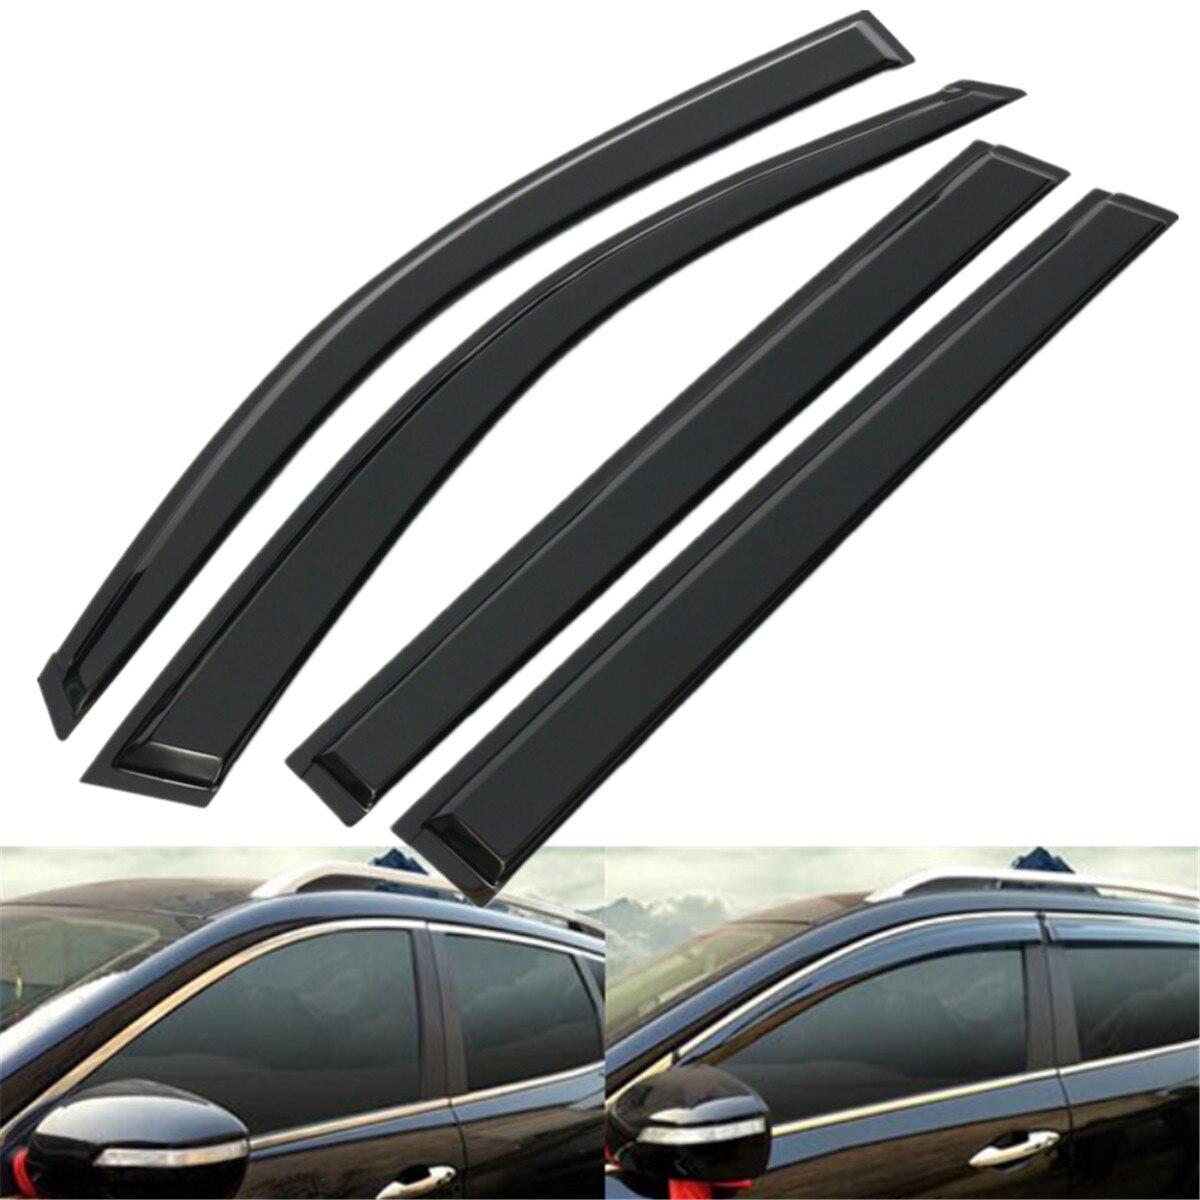 Black sun window visor rain guard set fits for toyota highlander 2008 2012 china